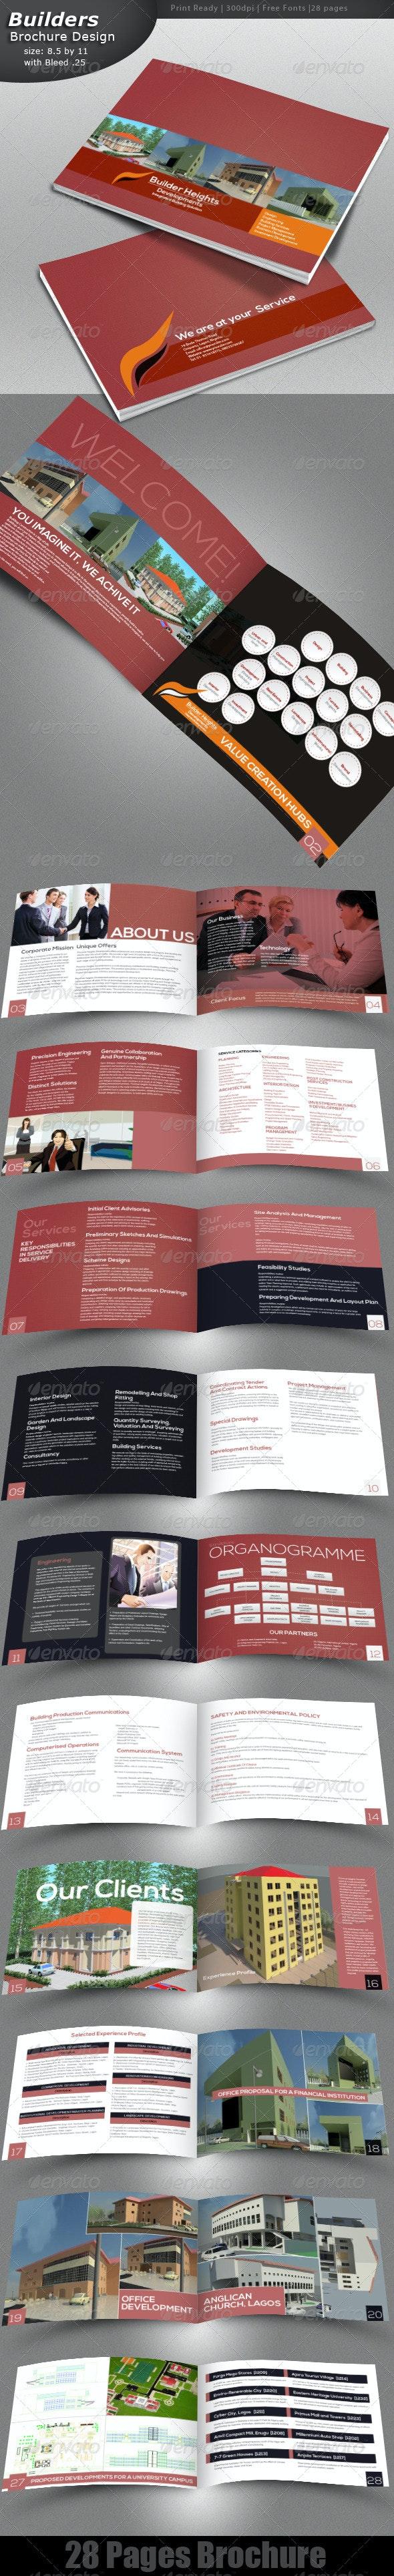 Construction Brochure - Brochures Print Templates